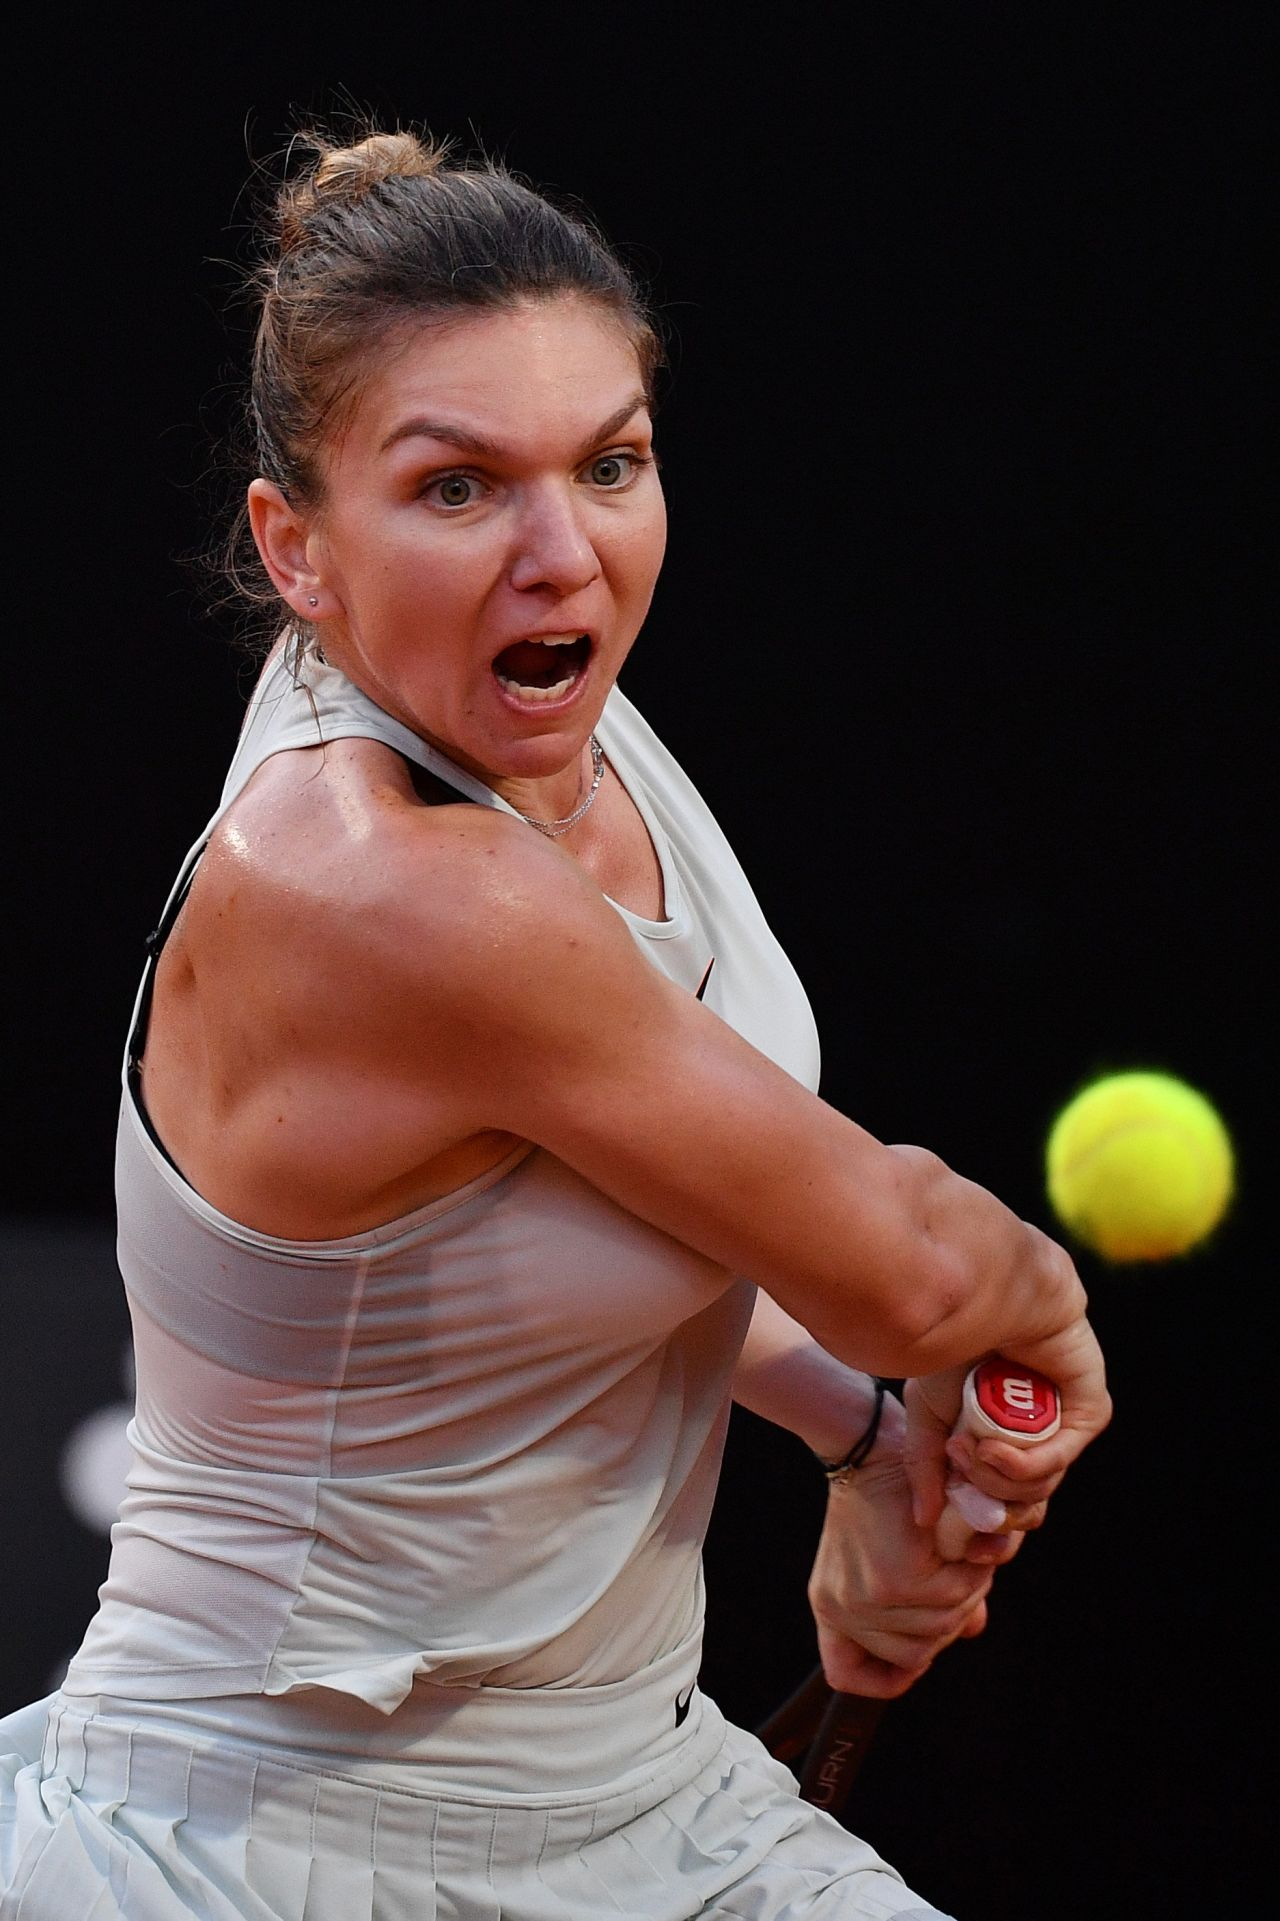 Simona Halep - 2018 Australian Open in Melbourne - Day 6